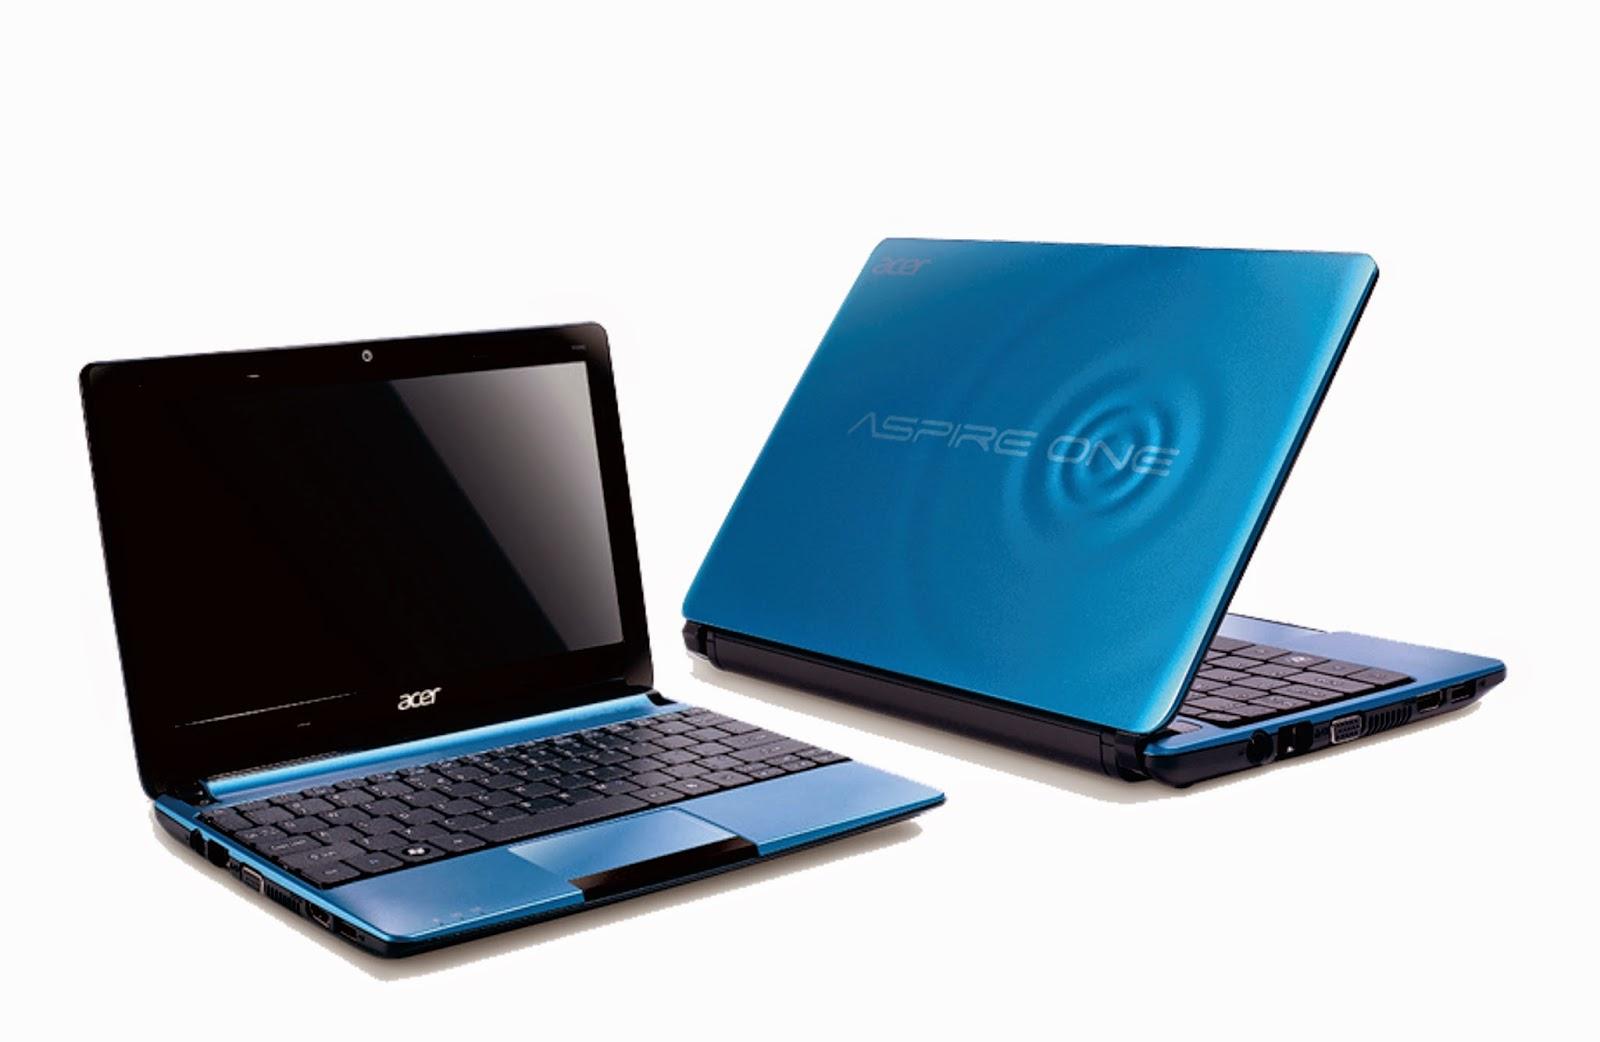 acer aspire one d270 drivers for windows xp download center rh romantro blogspot com Acer Aspire One D270 1410 Acer Aspire Function Keys List